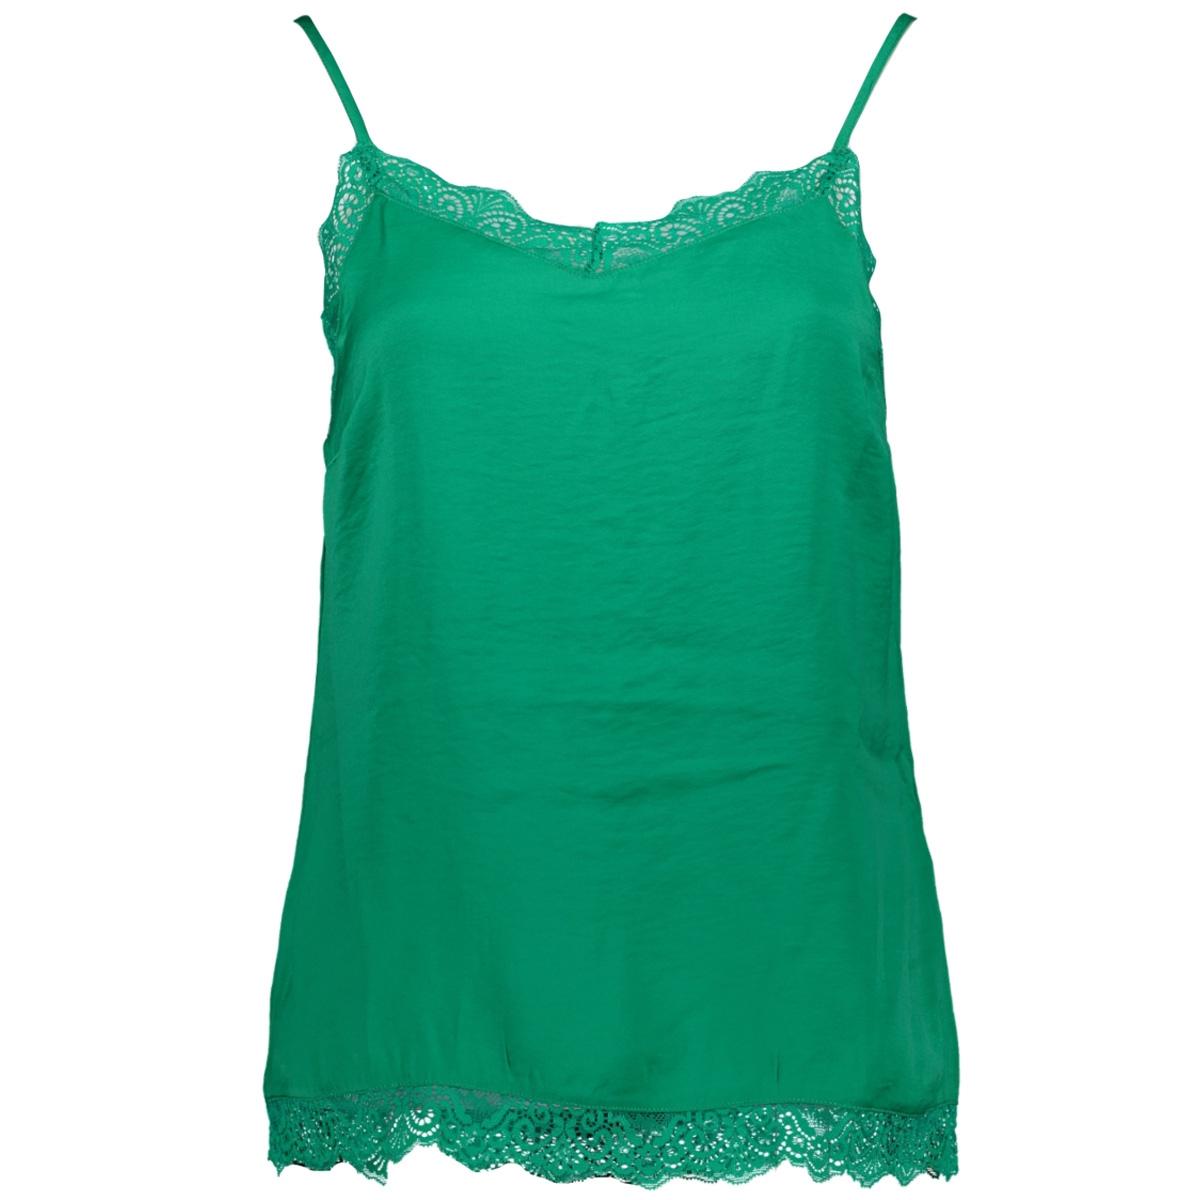 vicava lace singlet fav 14045939 vila top pepper green